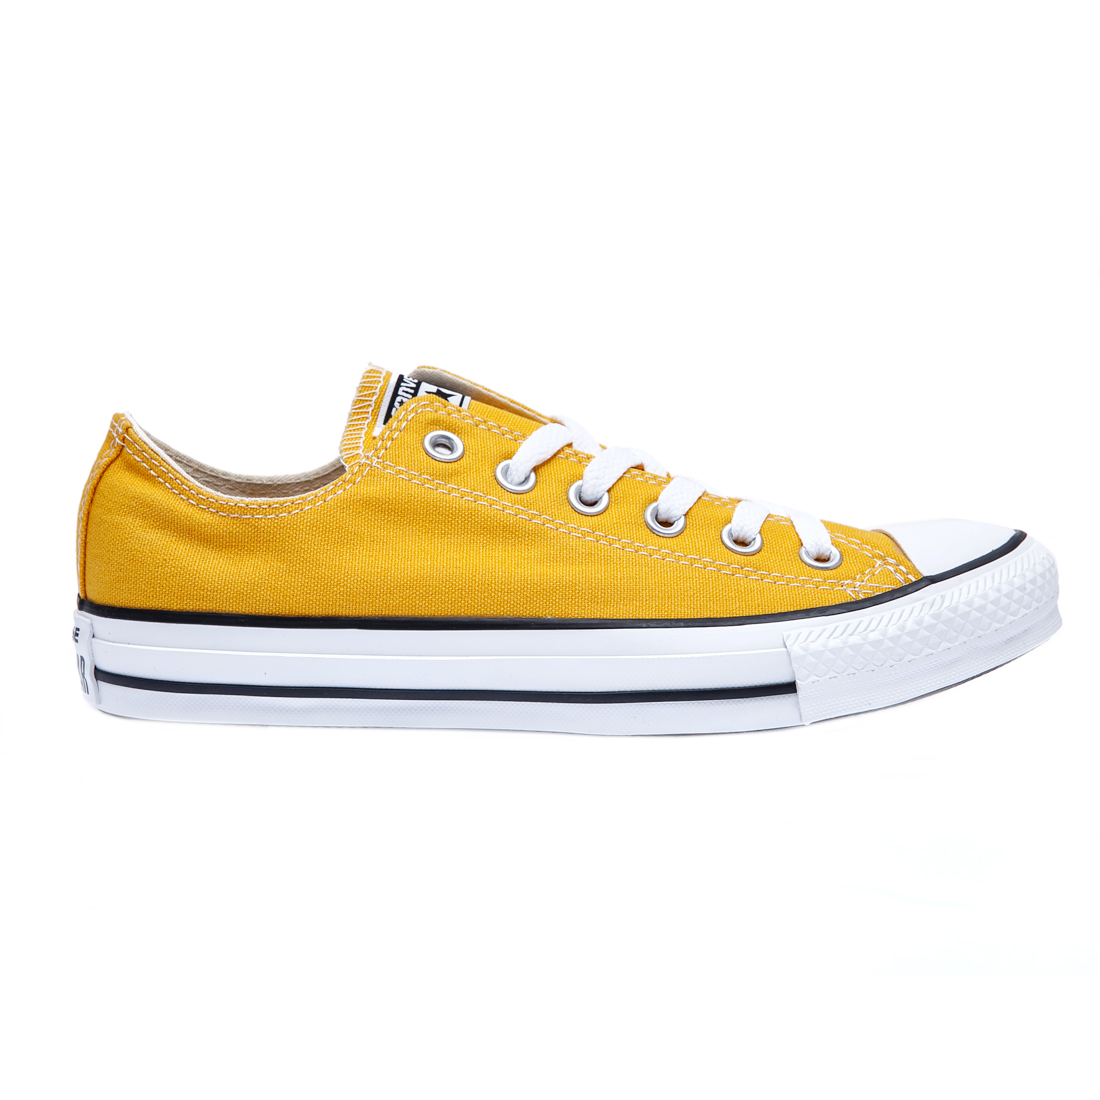 CONVERSE - Unisex παπούτσια Chuck Taylor κίτρινα σκούρα γυναικεία παπούτσια sneakers